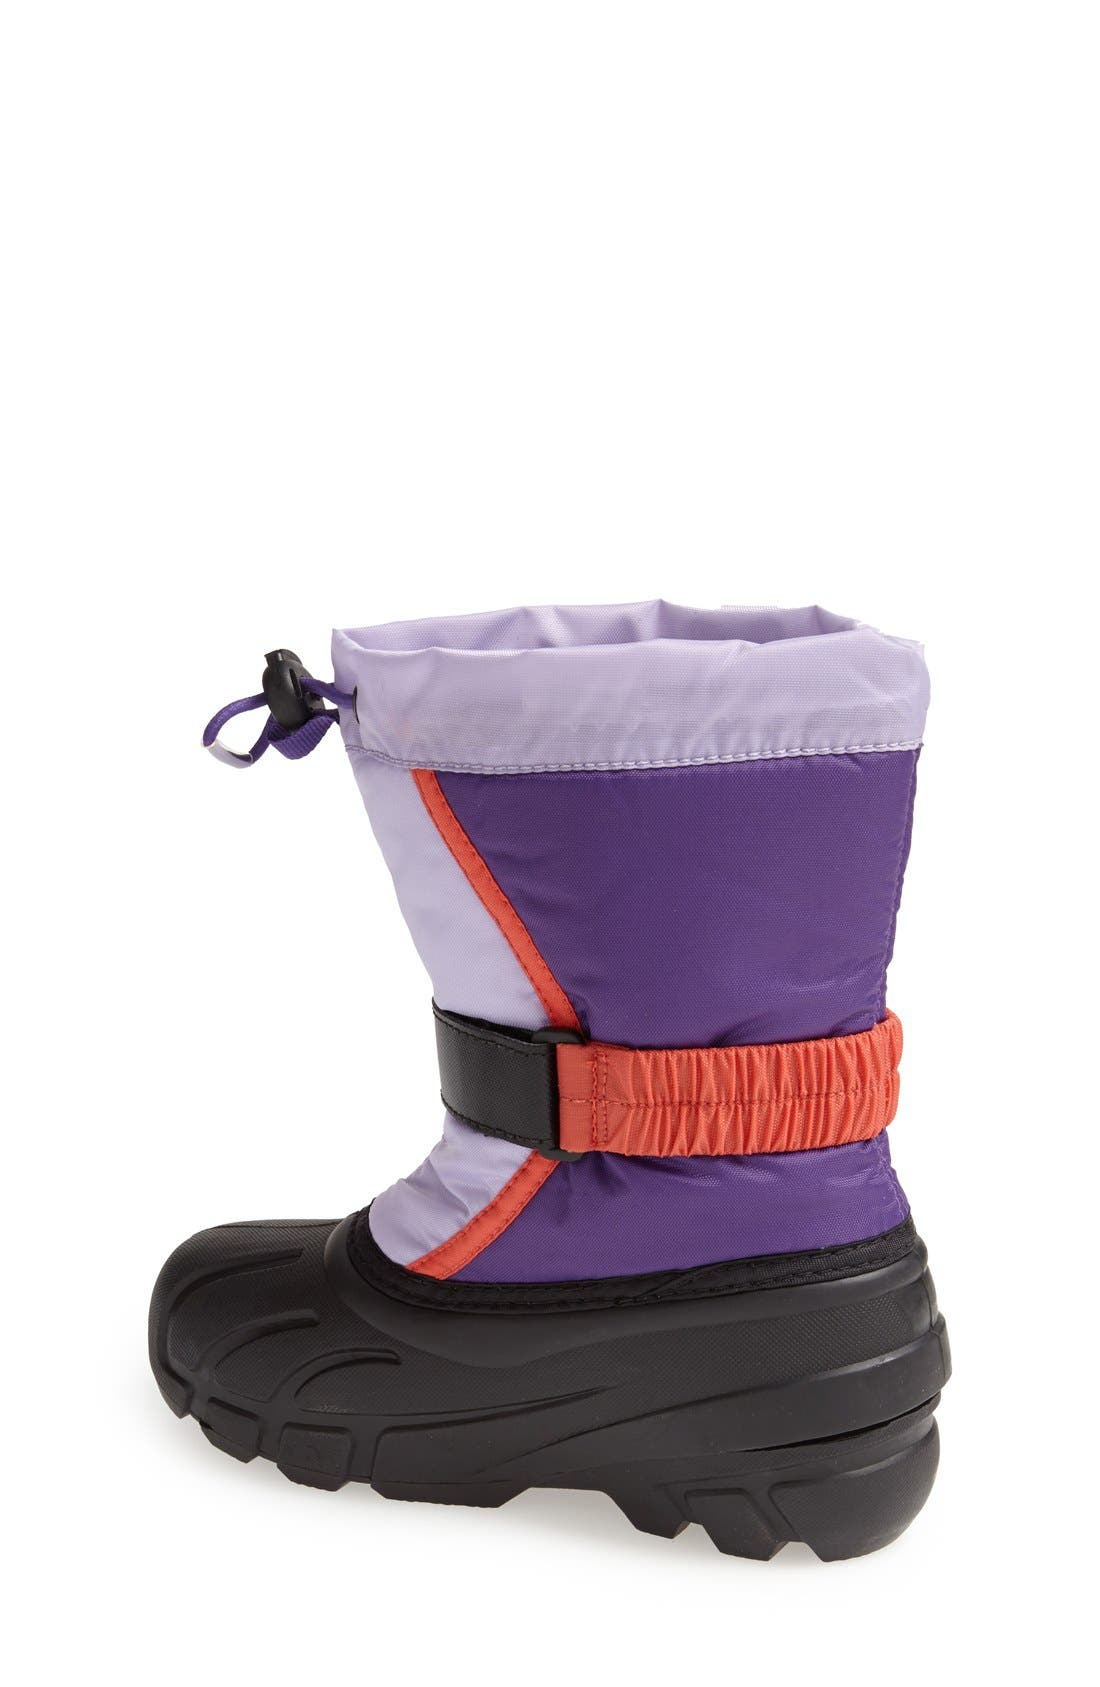 Alternate Image 2  - Sorel 'Flurry' Boot (Toddler, Little Kid & Big Kid)